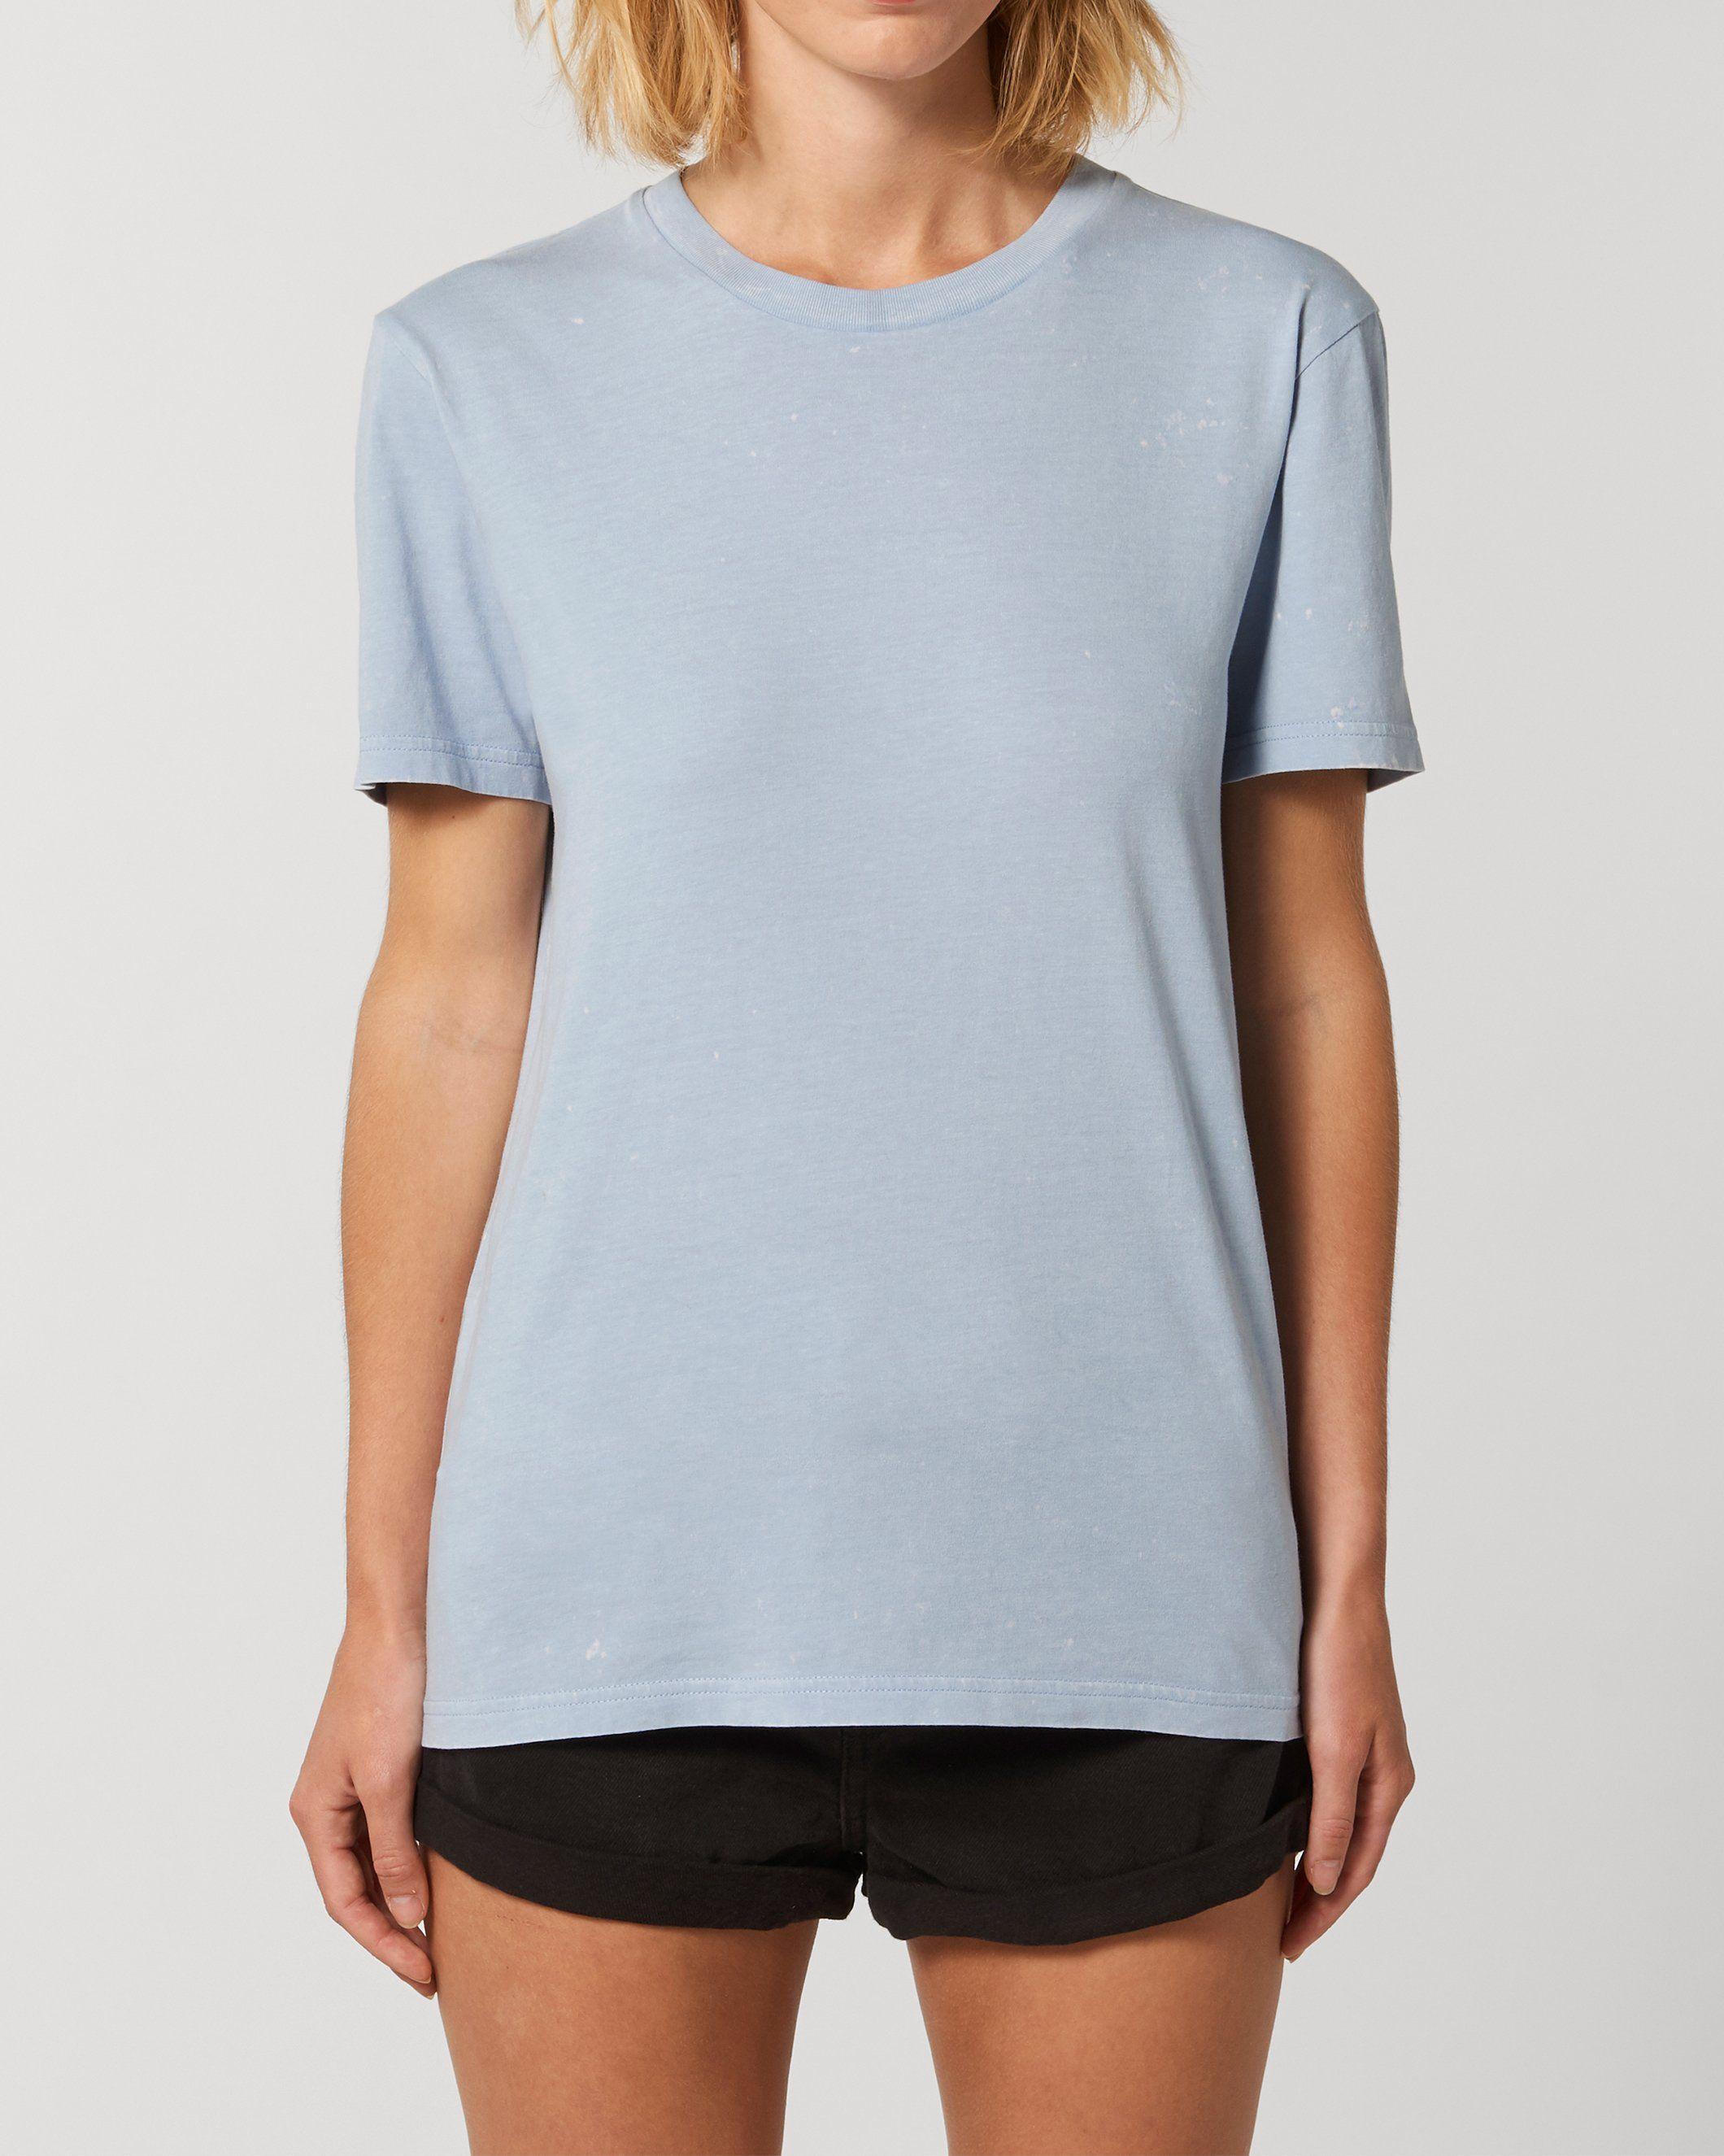 Nati-Neti Unisex Garment Dyed T-Shirt in Blue